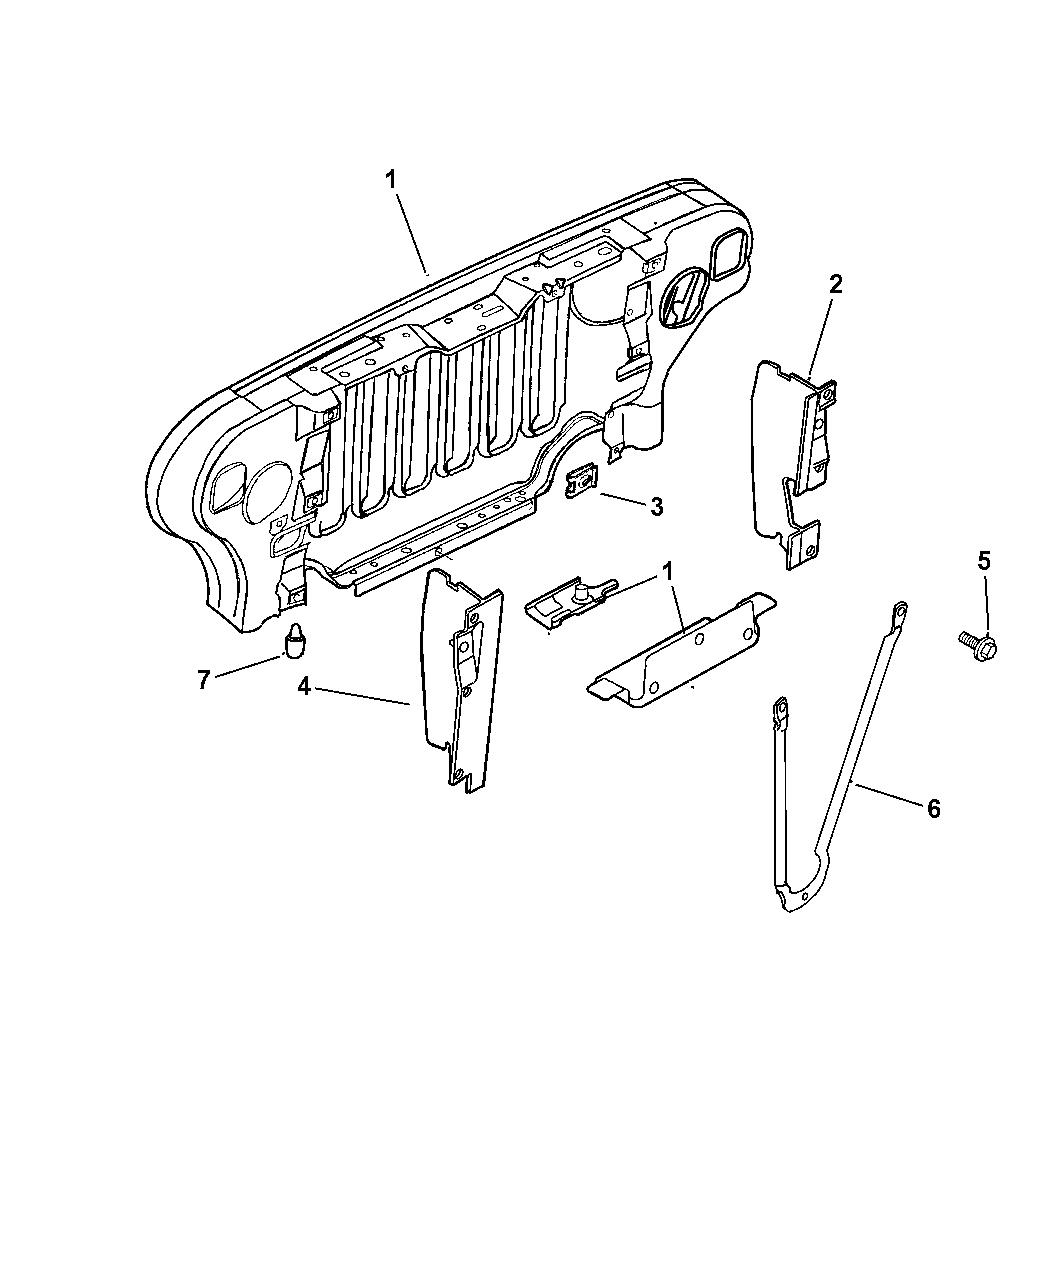 Resource T D Amp S L Amp R Ab C Ee C Ba F C A A B B Cdf E C B D on Jeep Wrangler Oem Parts Diagram Grille